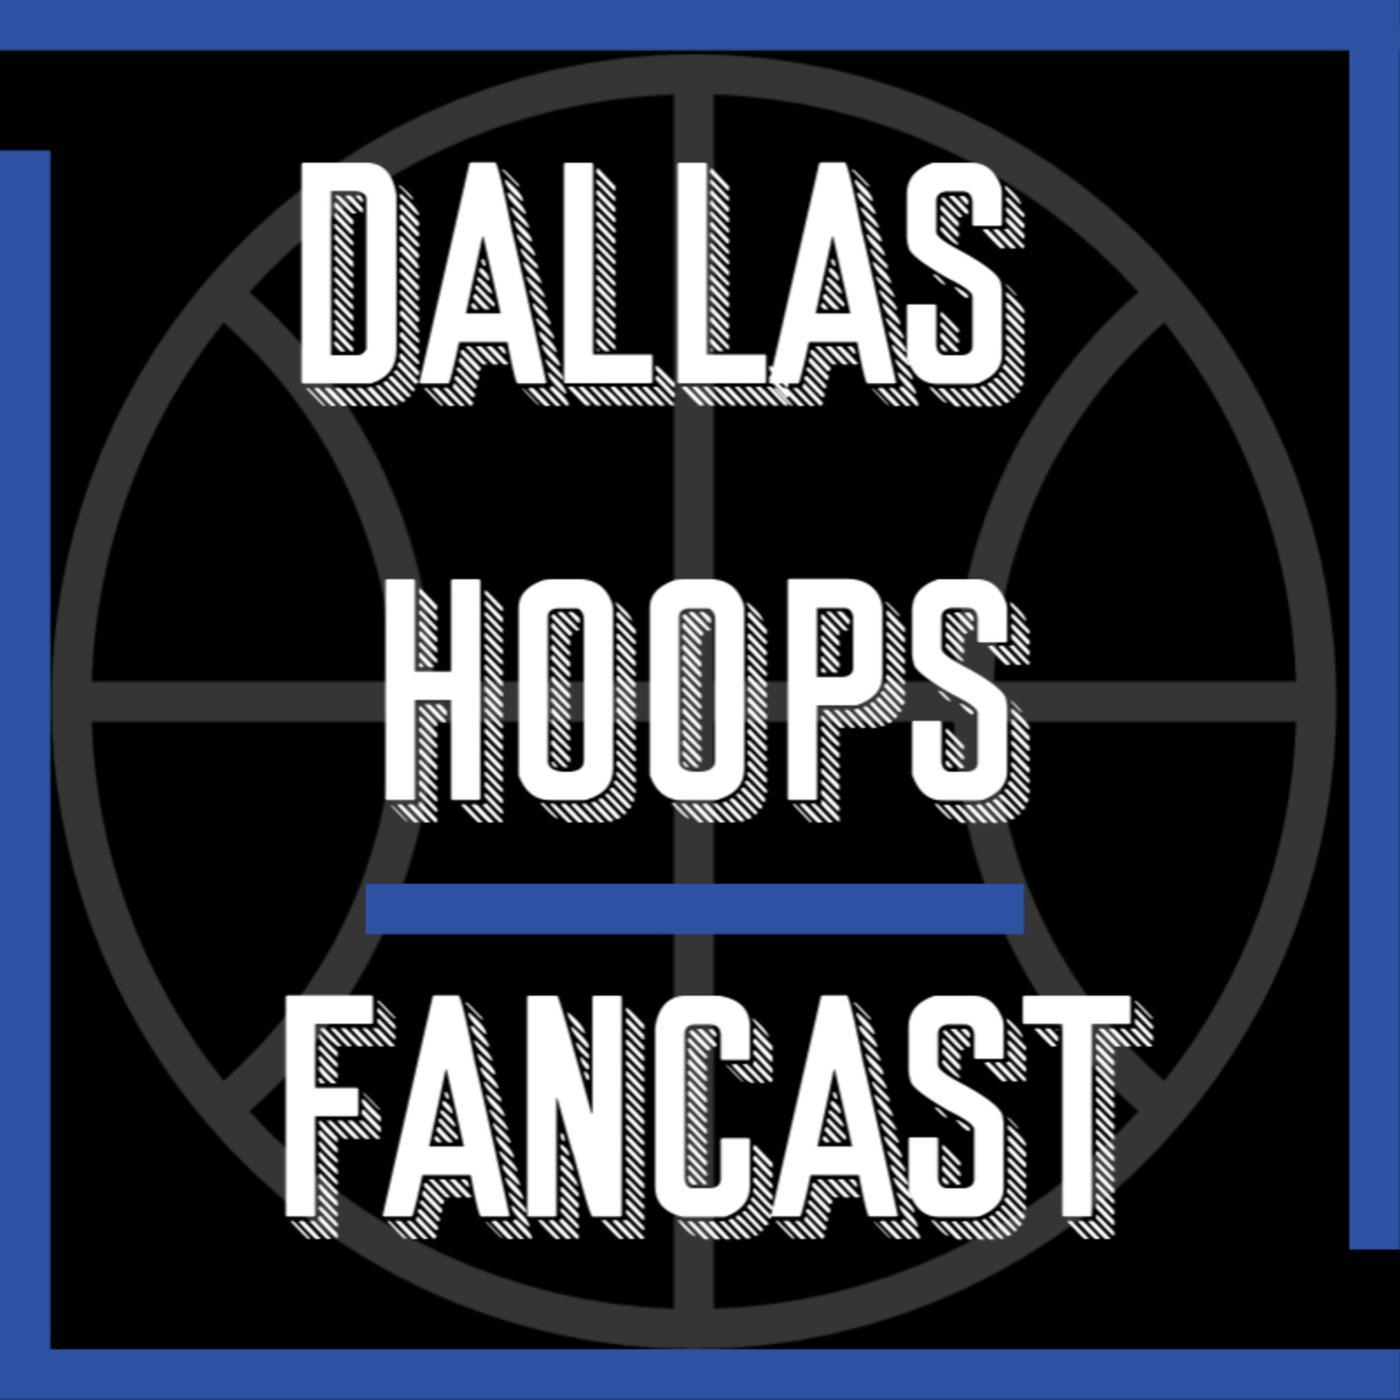 Dallas Hoops Fancast A Podcast For Dallas Mavericks Fans